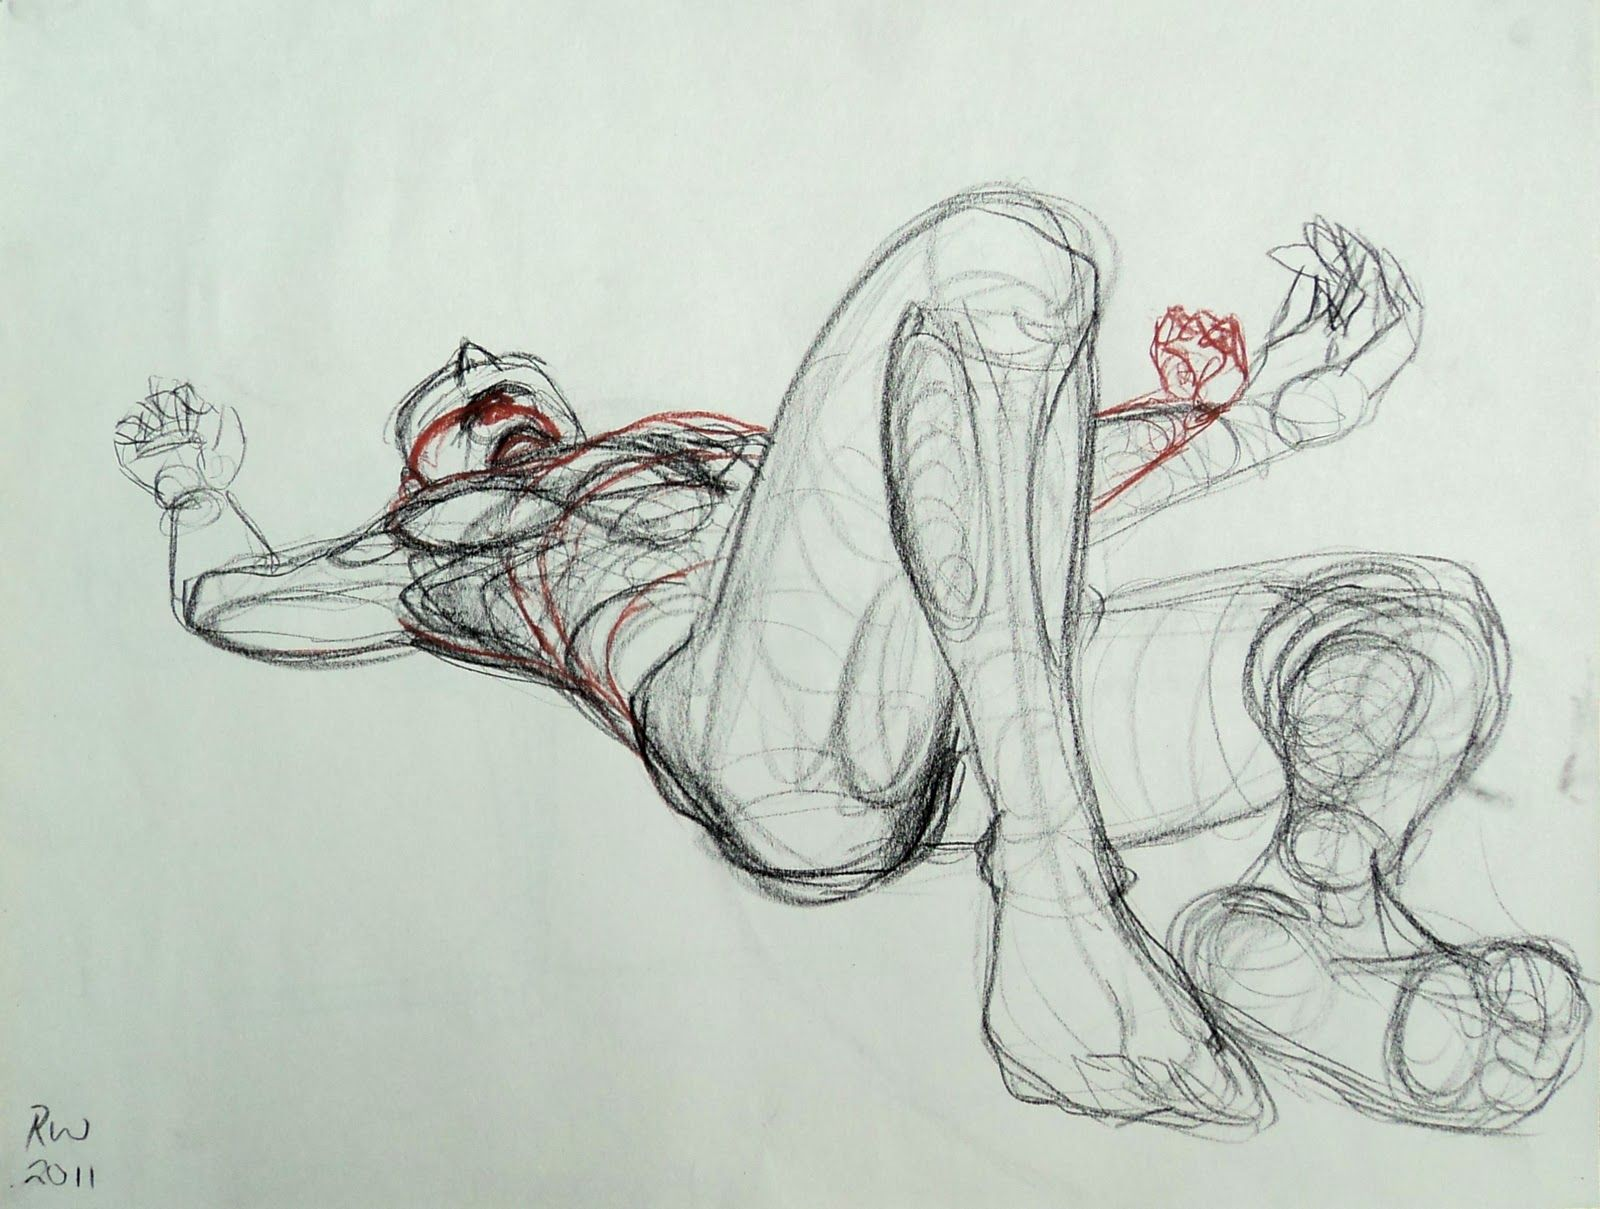 foreshortened+figure+study | Foreshortening | Pinterest | Drawings ...